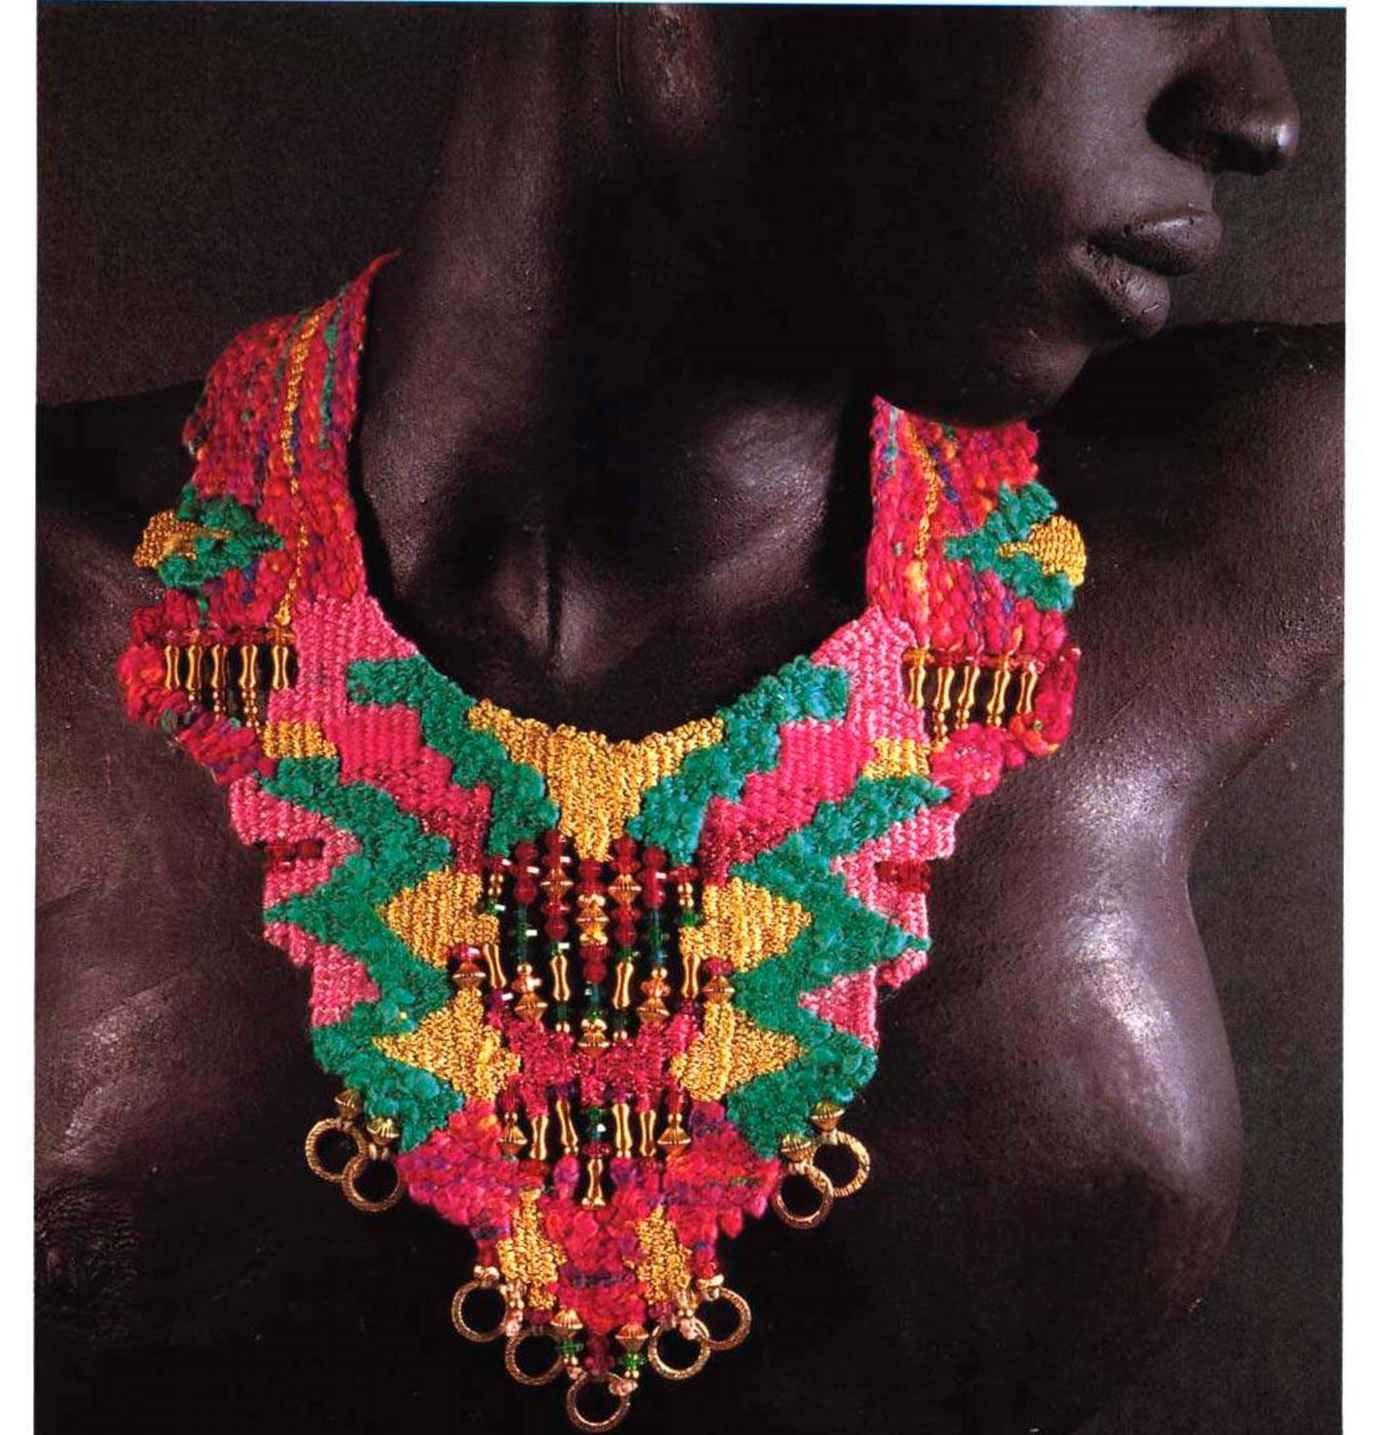 Geometrical perler bead patterns pinterest bead geometrical perler bead patterns bankloansurffo Gallery